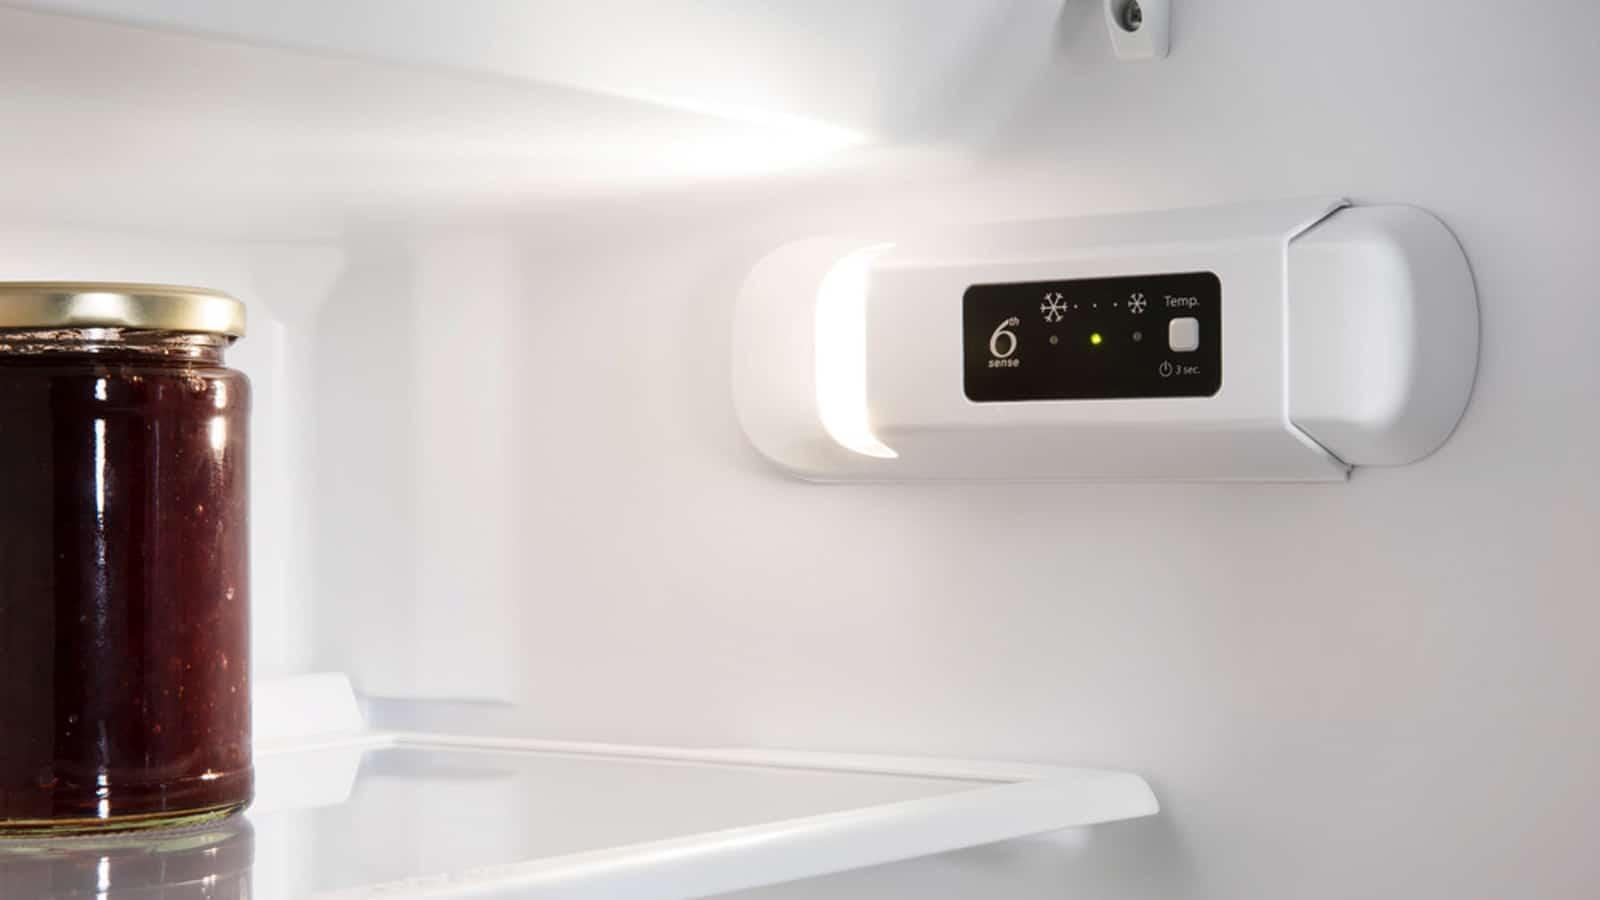 Whirlpool-Built-In-Fridge-ARG-7191_A+_1-a